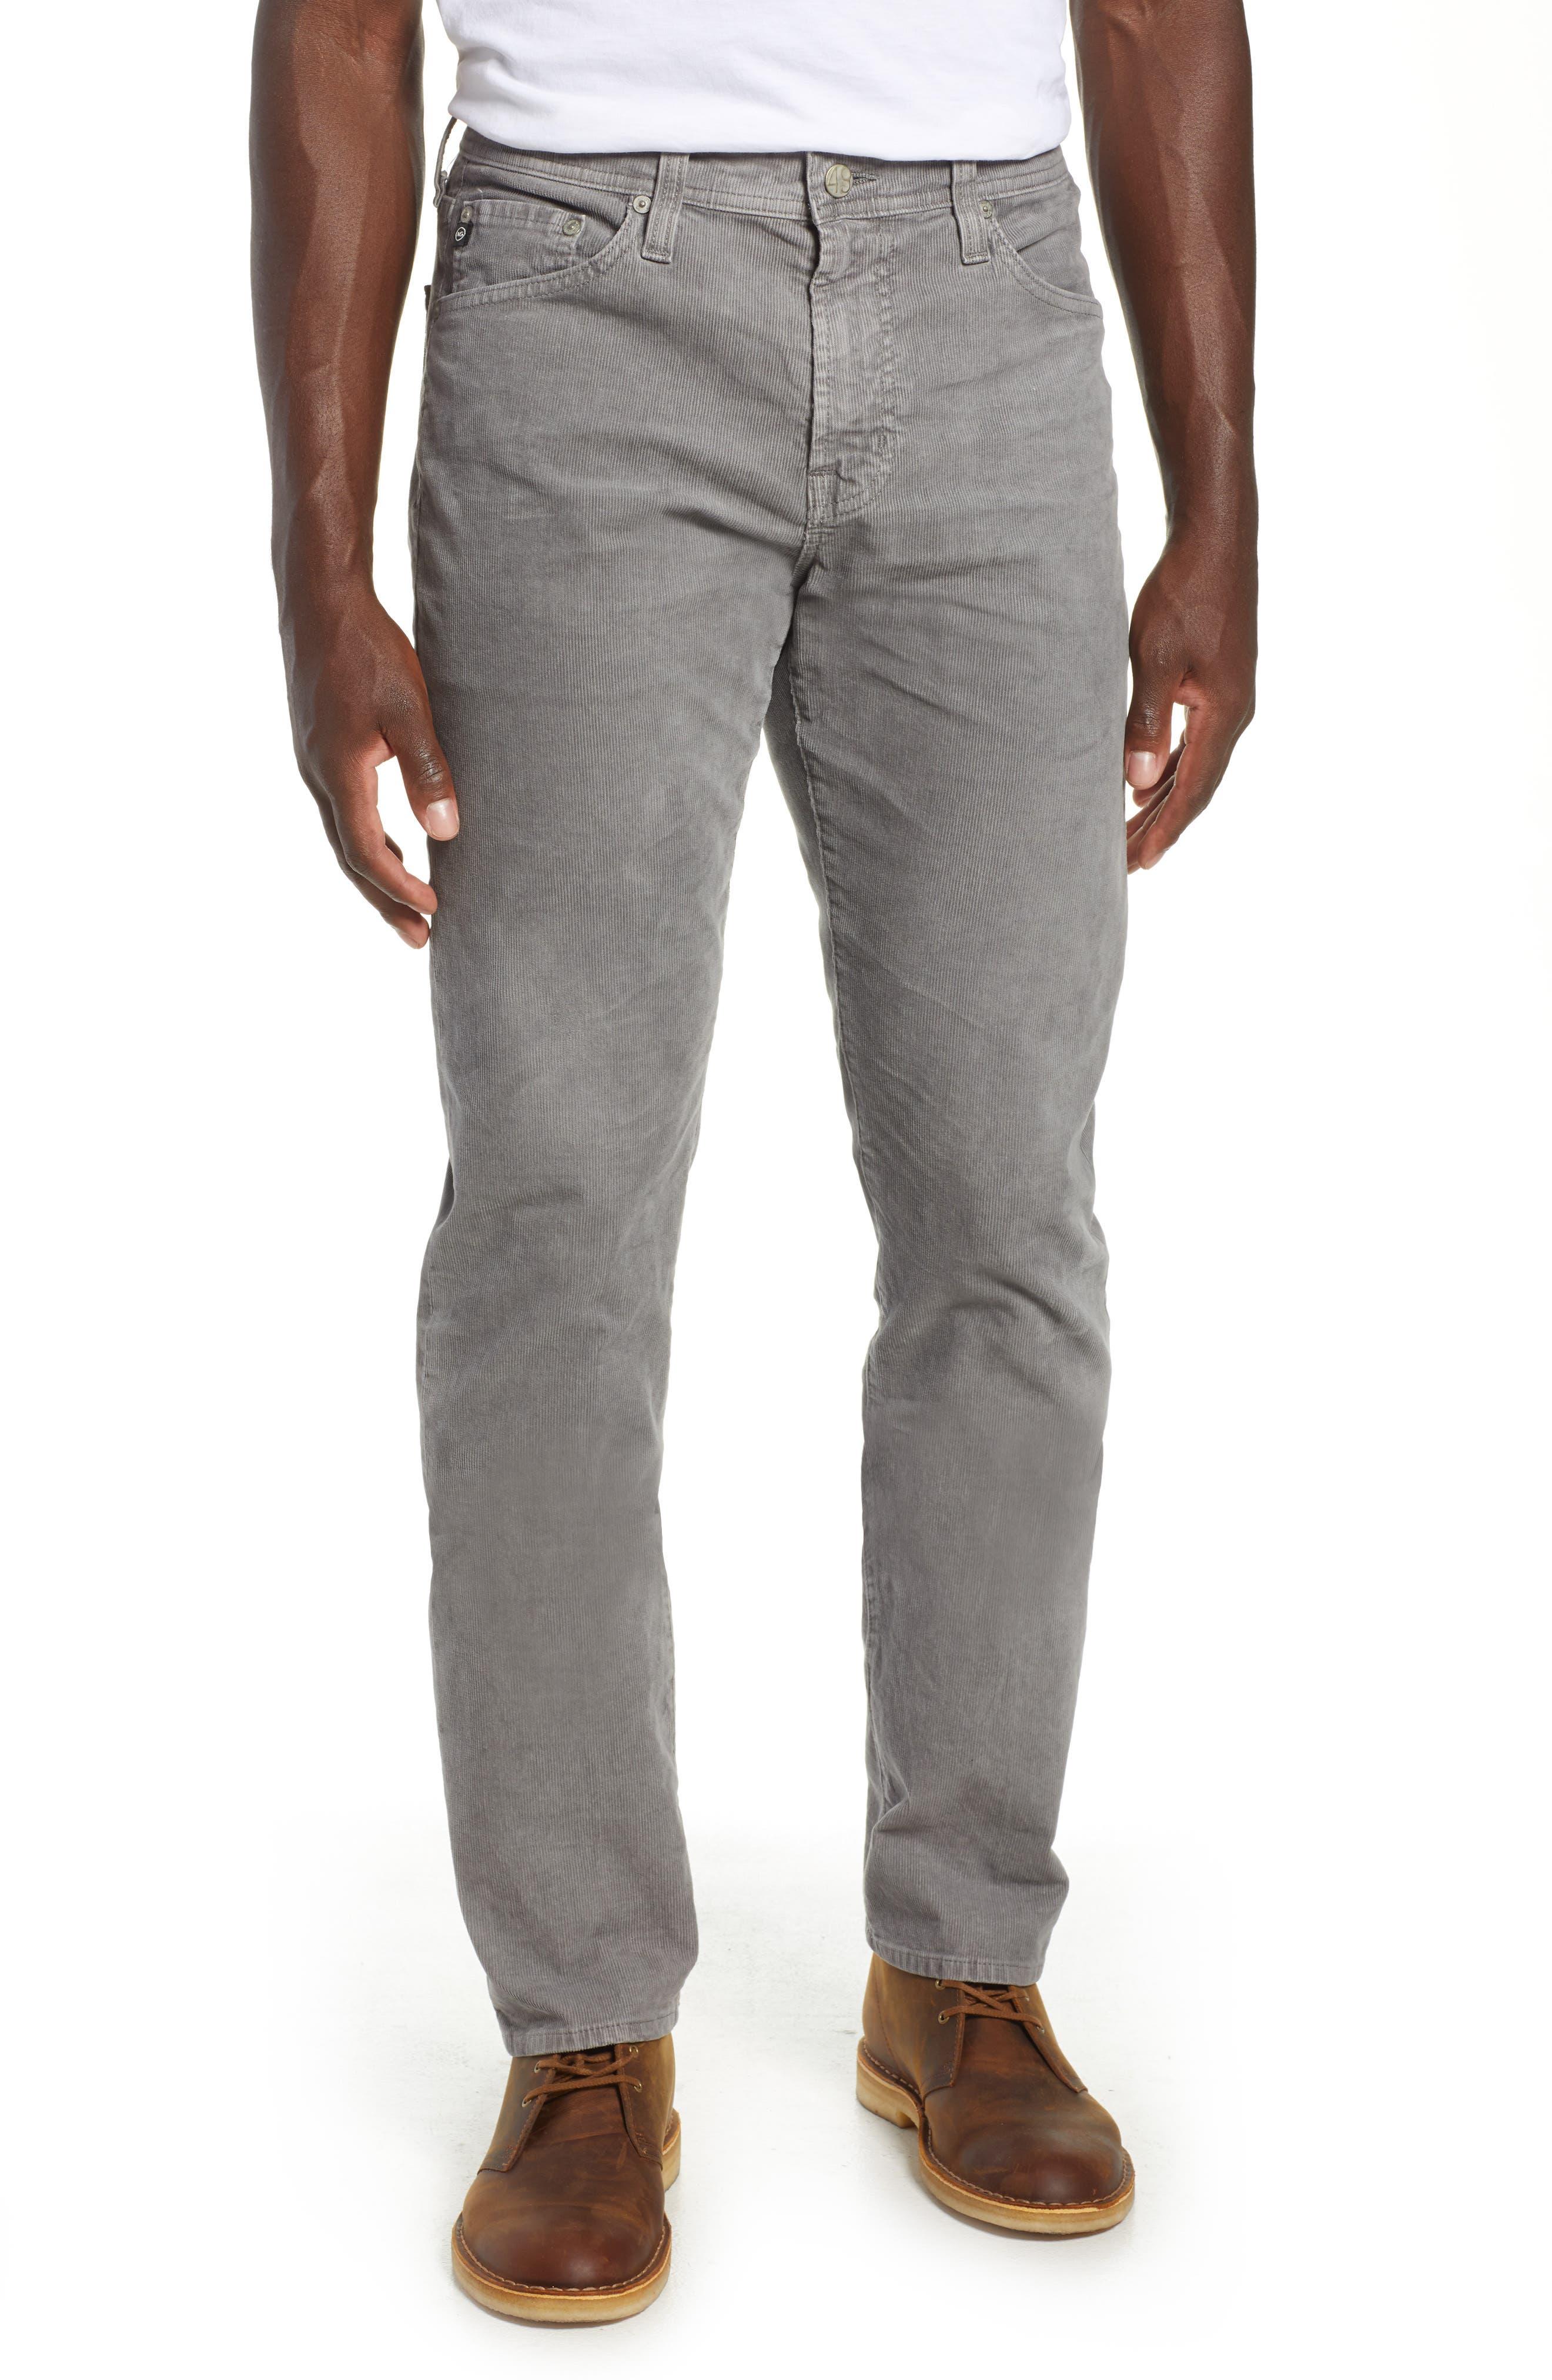 Everett Straight Leg Corduroy Pants,                             Main thumbnail 1, color,                             SULFUR AUTUMN FOG